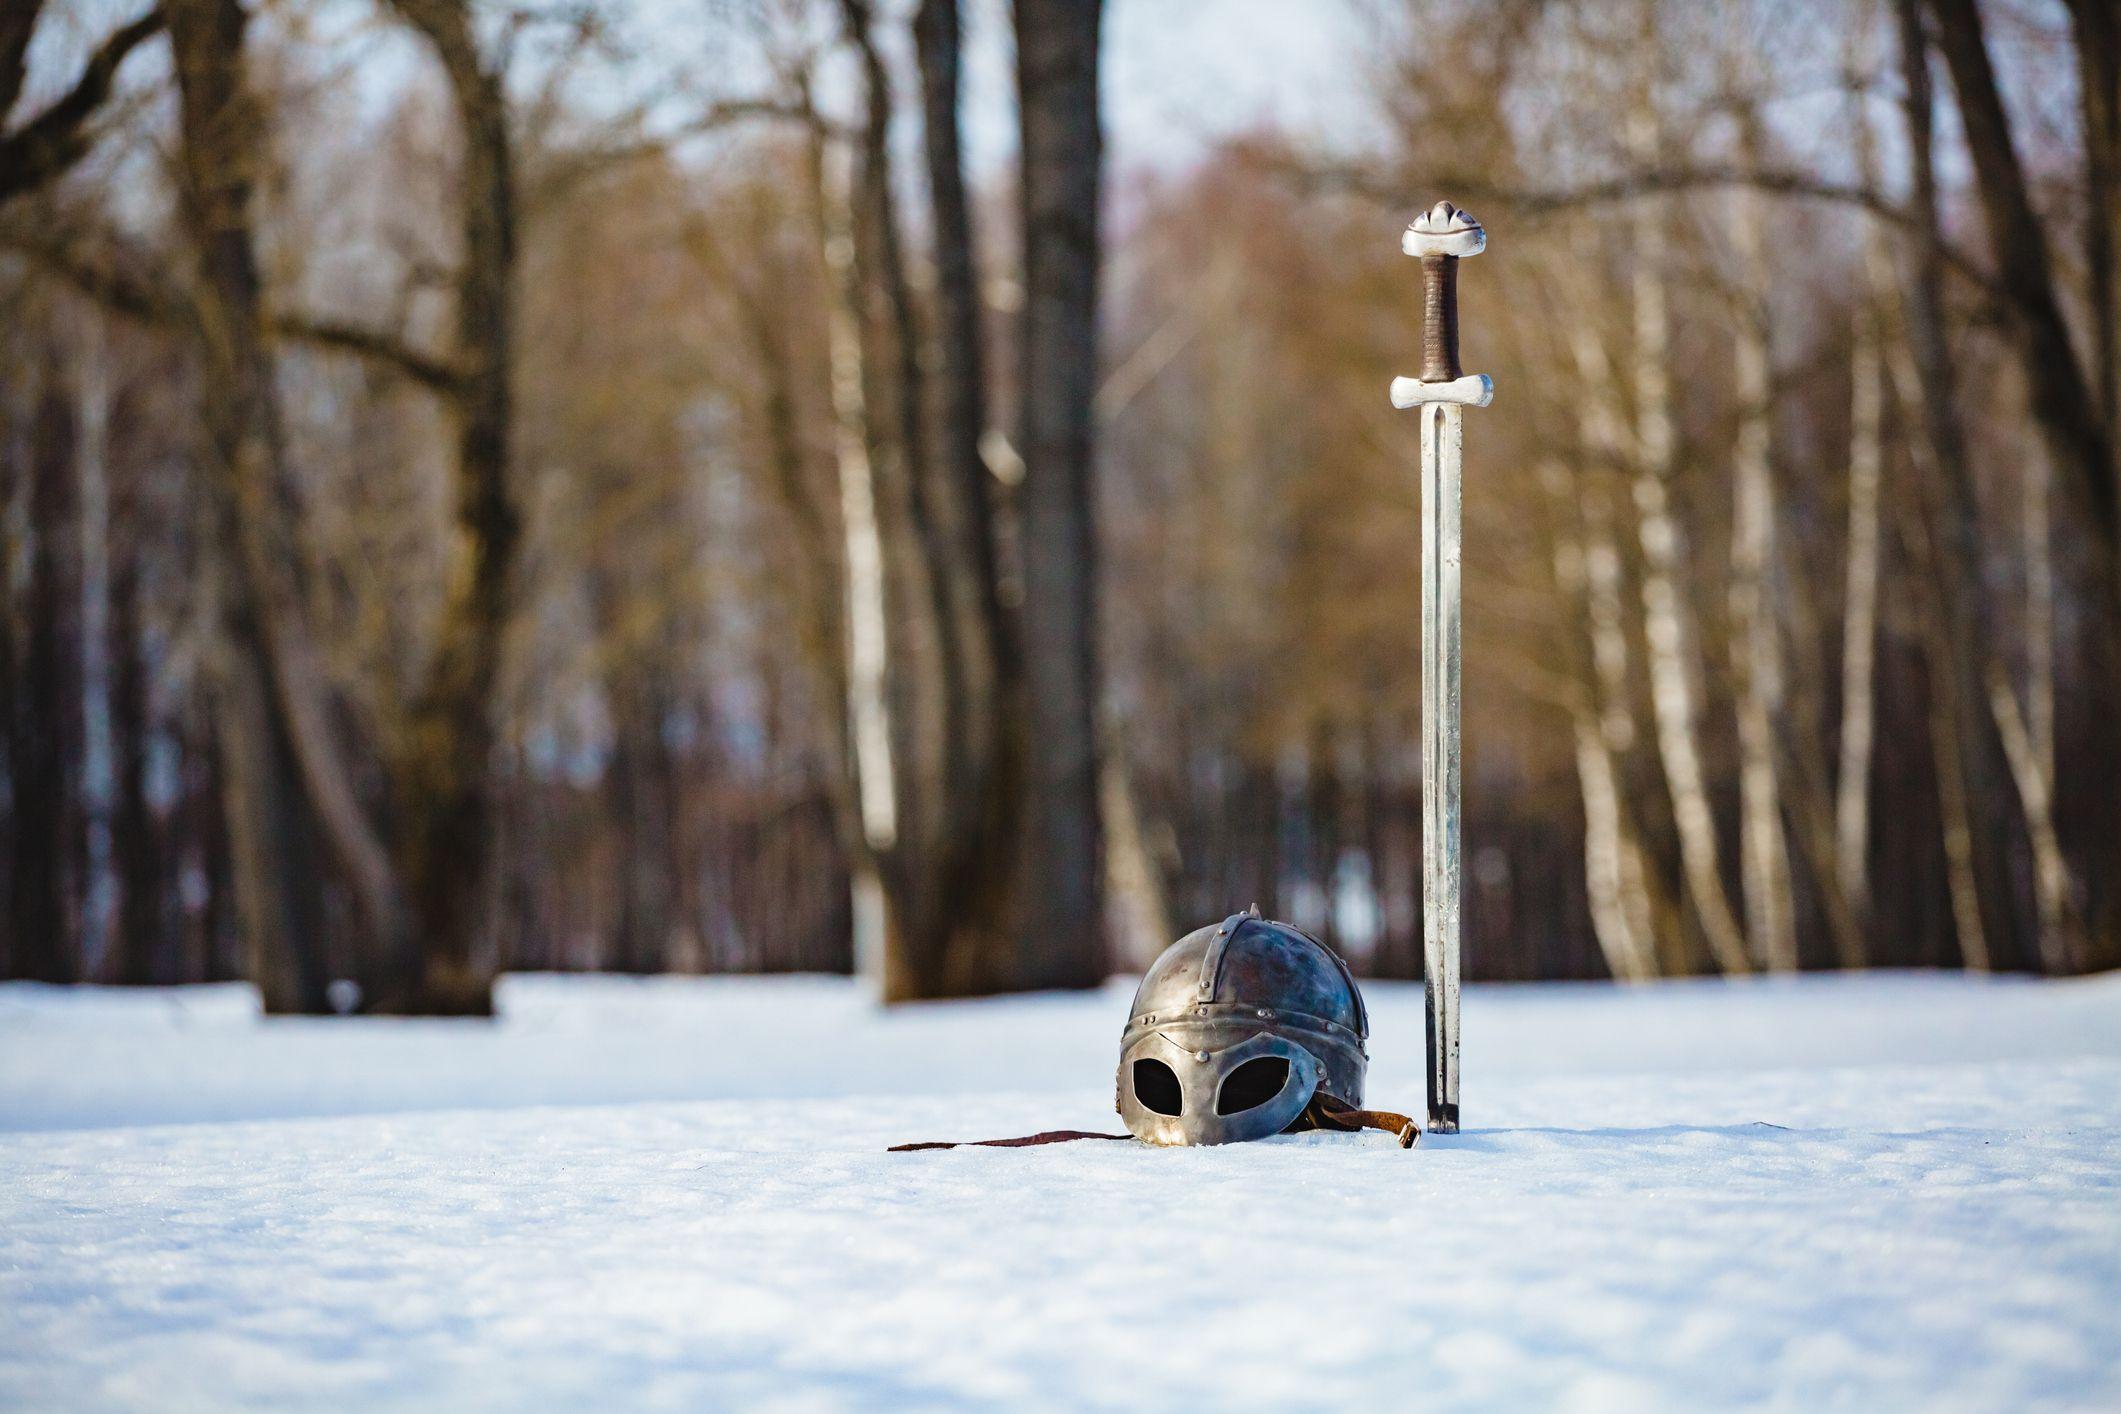 Sword and helmet in the snow